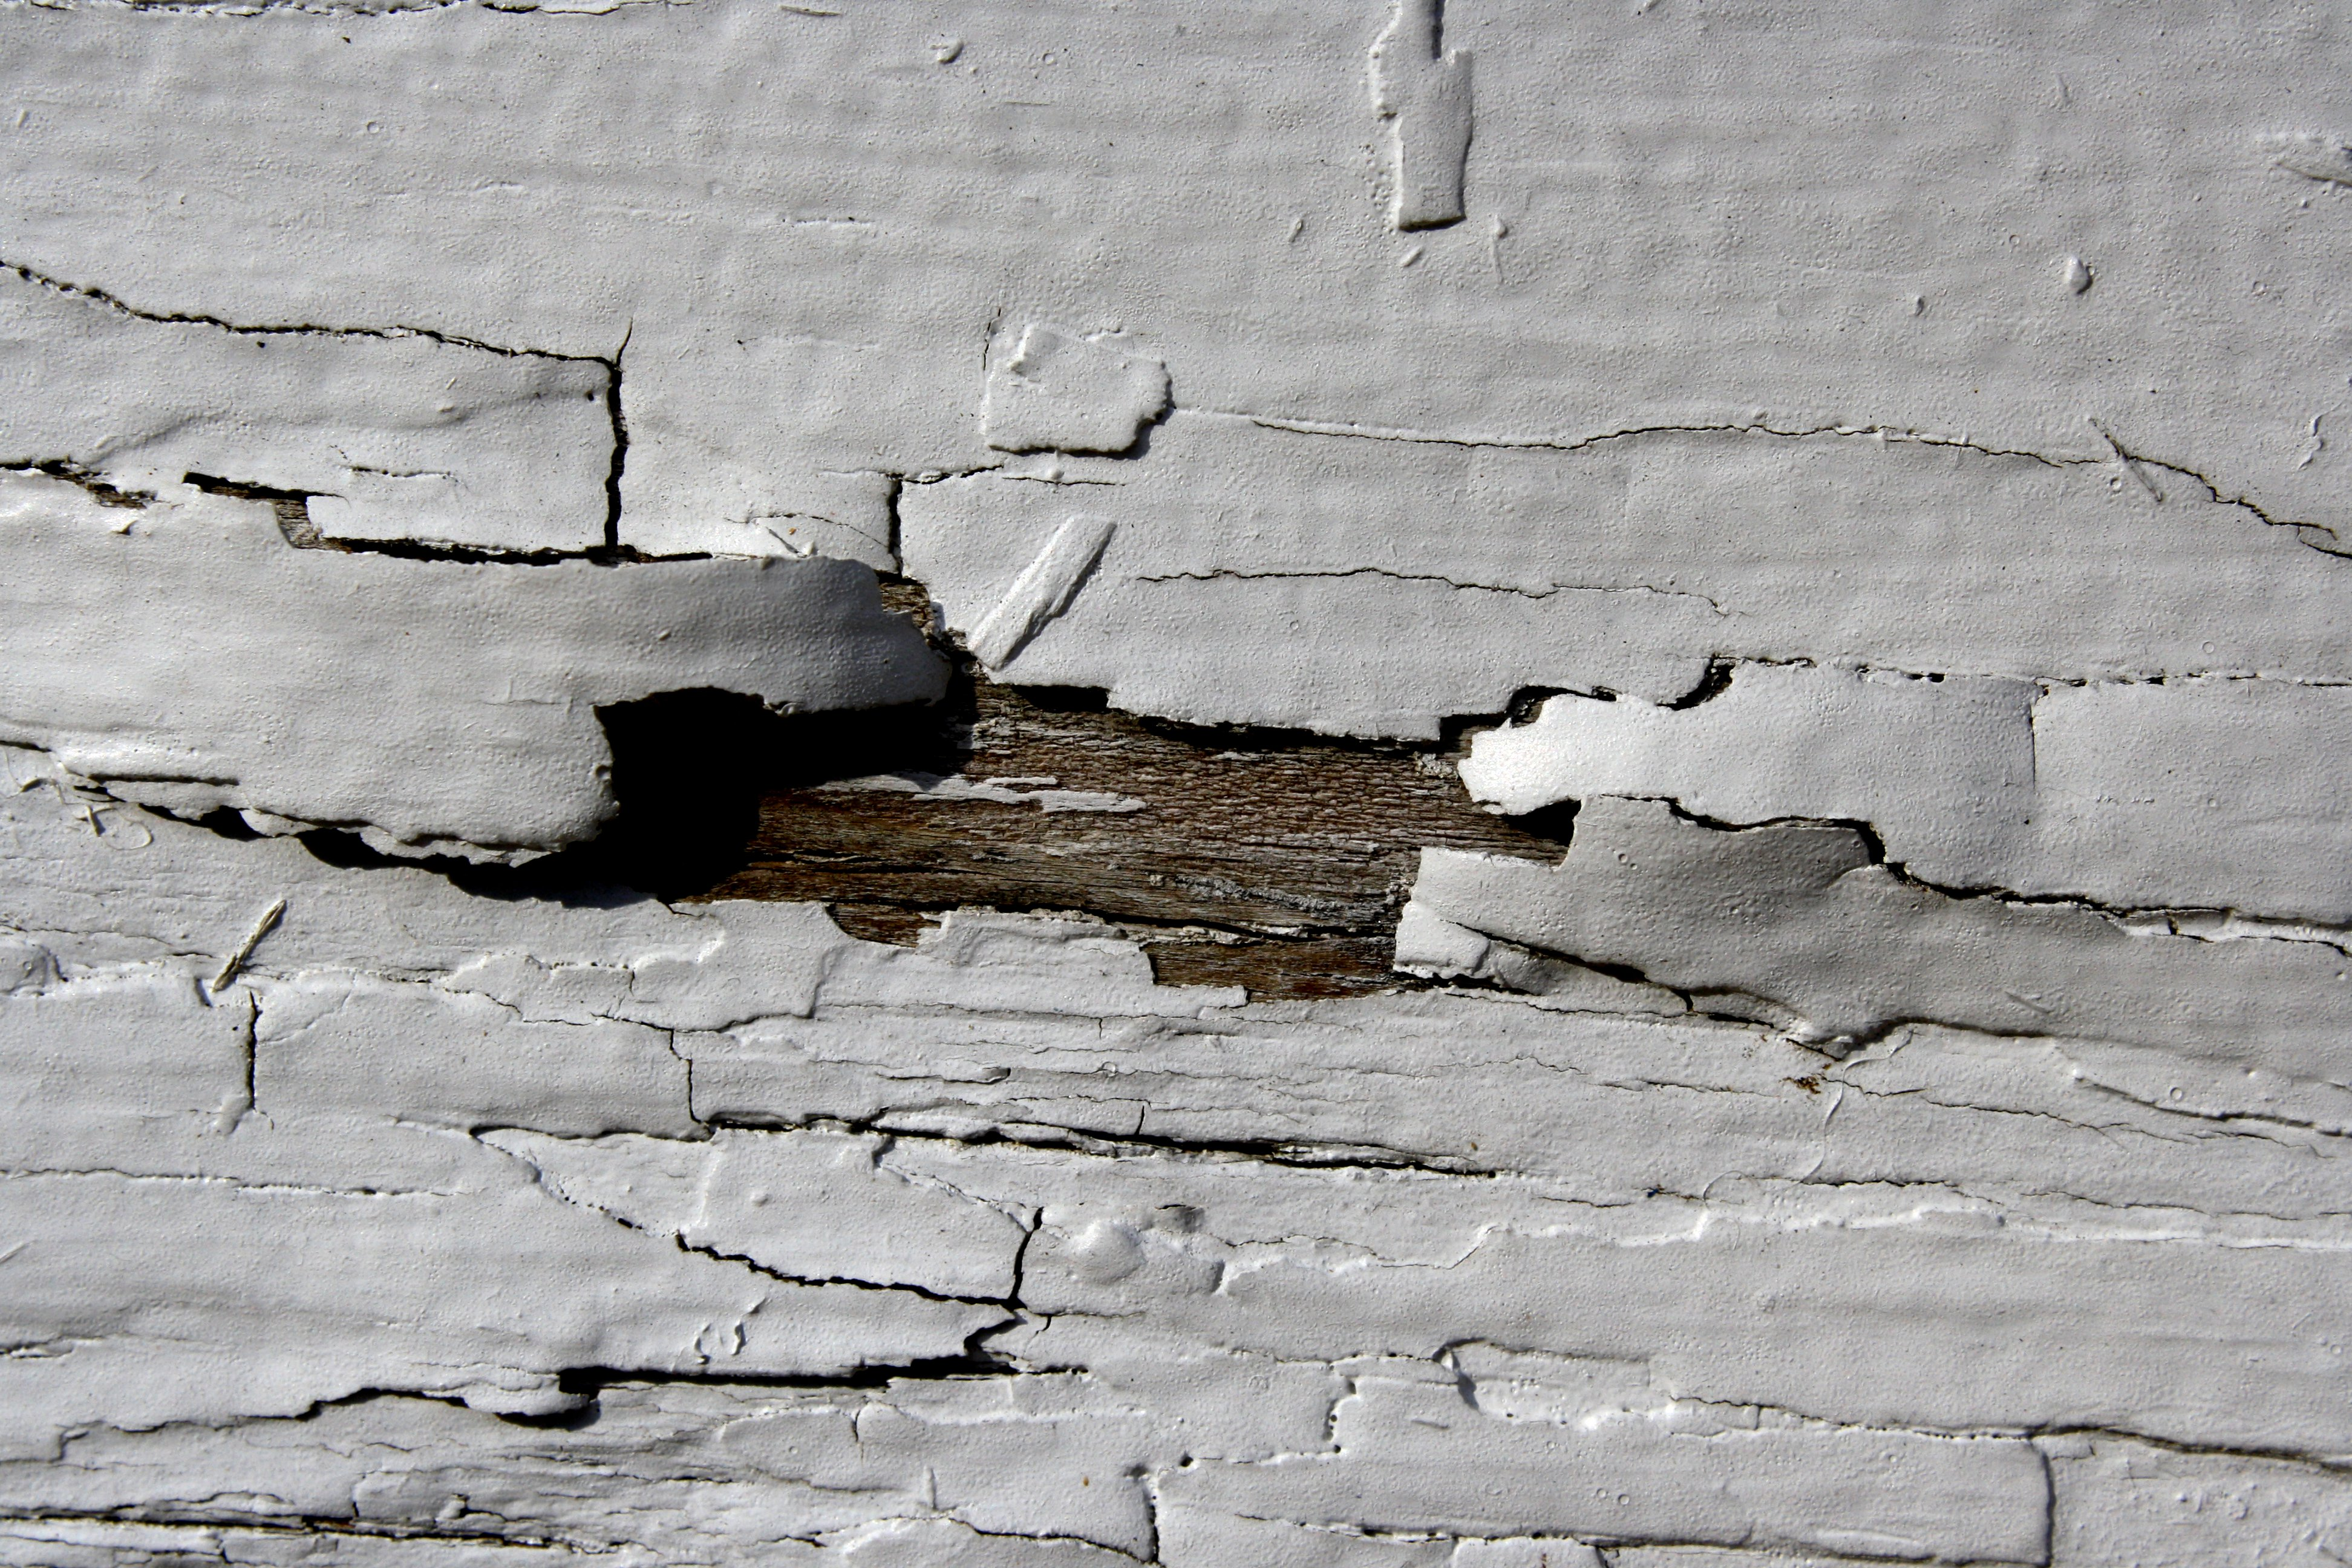 White Peeling Paint Texture Picture Free Photograph Photos